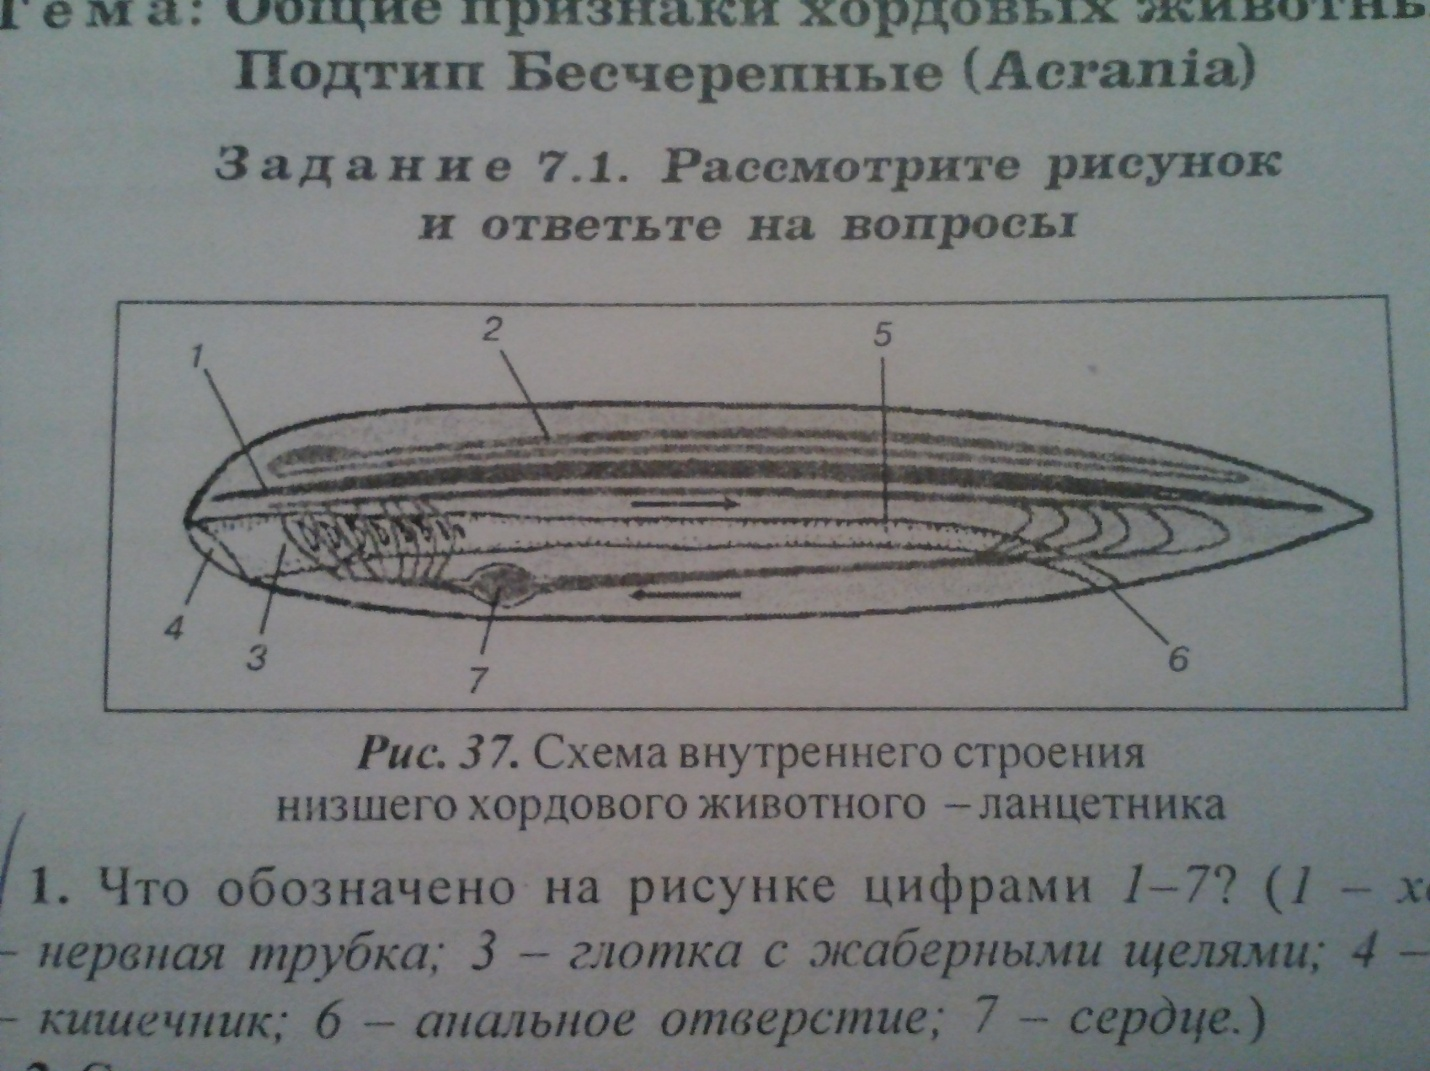 C:\Users\Елена Сергеевна\Desktop\IMG041.jpg